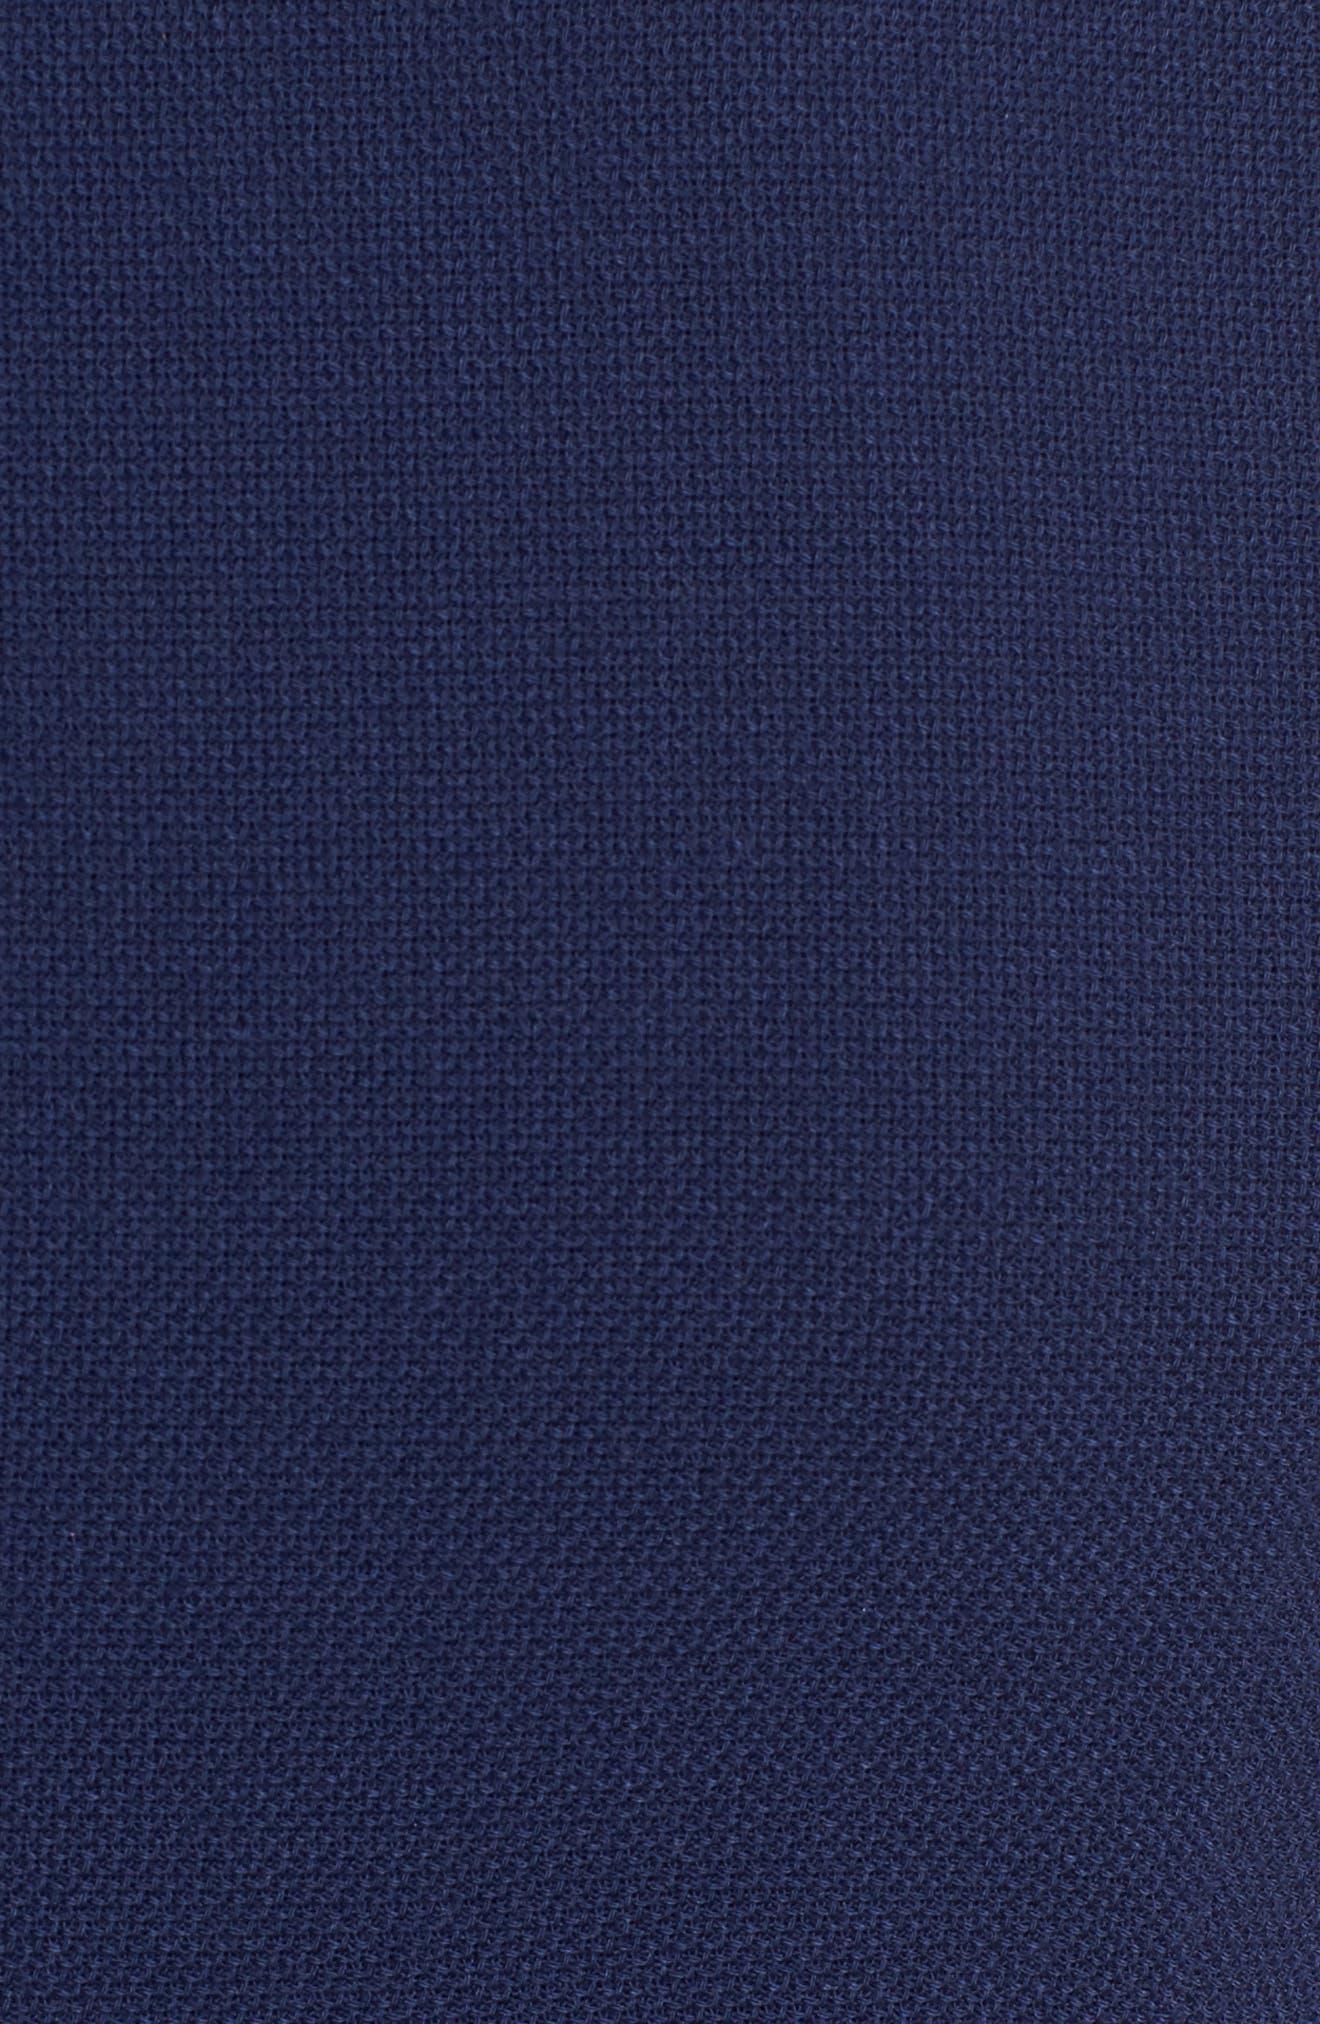 Dibalena Texture Stretch Dress,                             Alternate thumbnail 5, color,                             Nautical